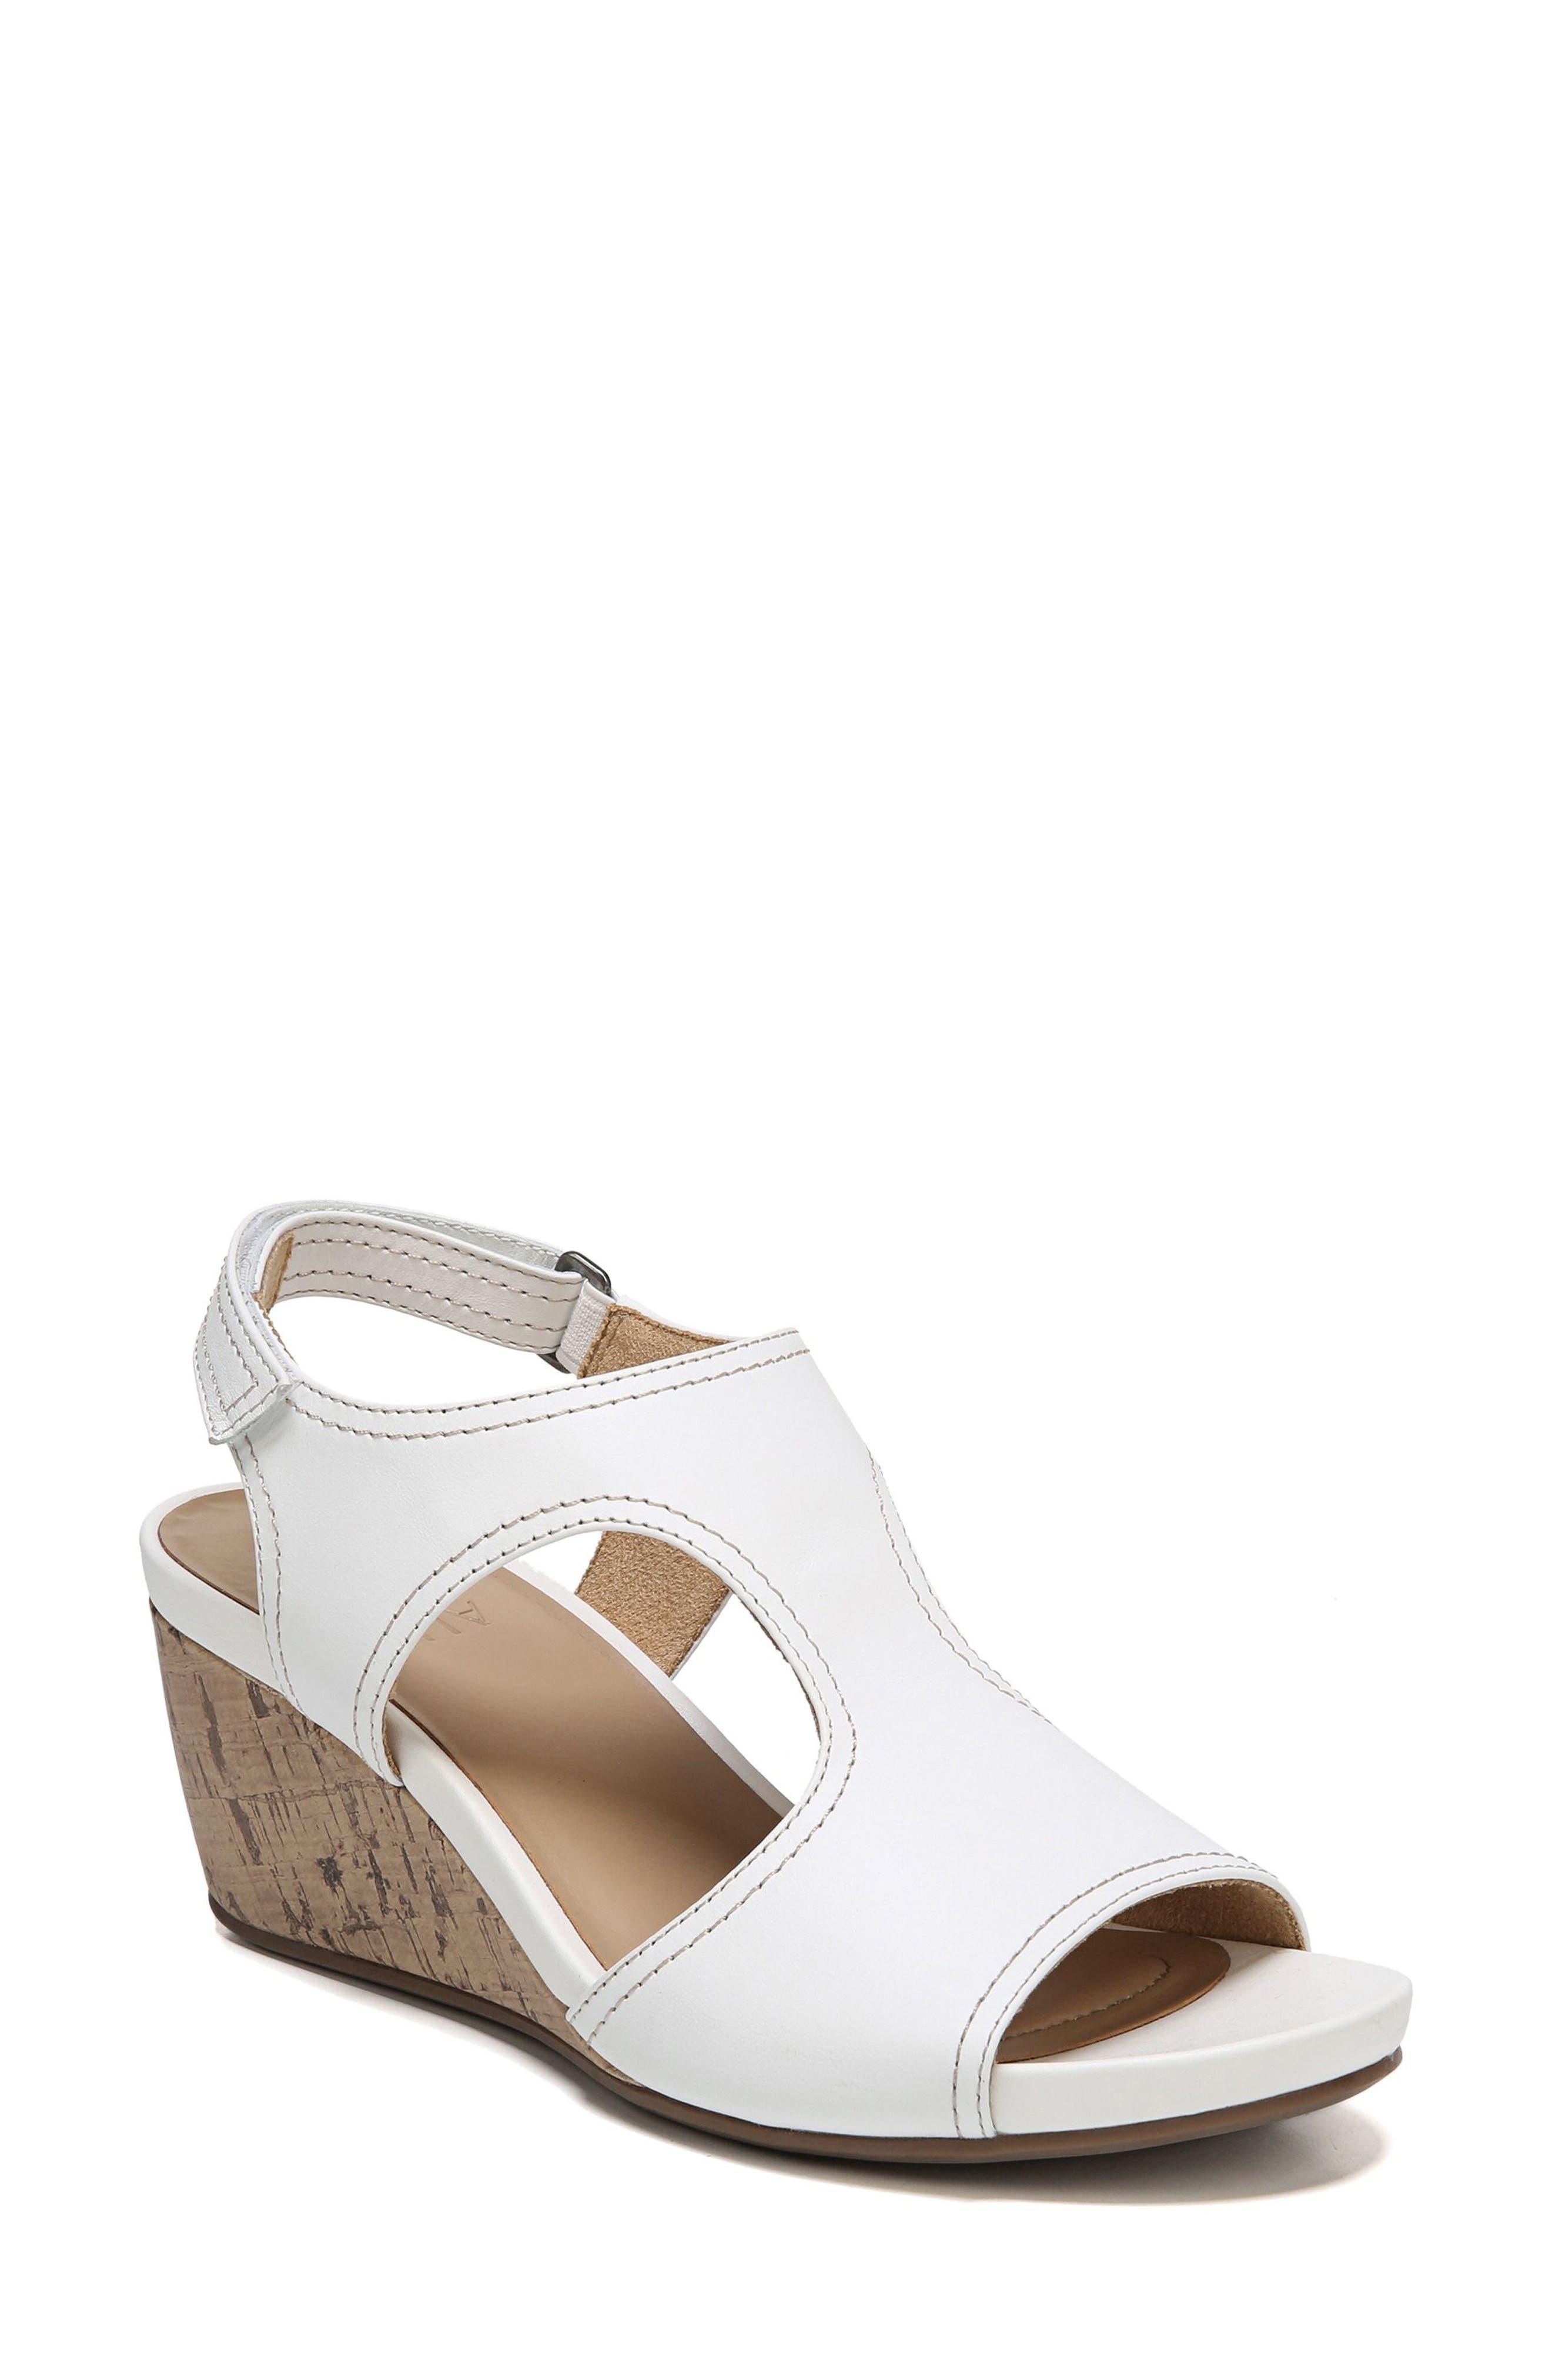 Cinda Wedge Sandal,                             Main thumbnail 1, color,                             White Leather